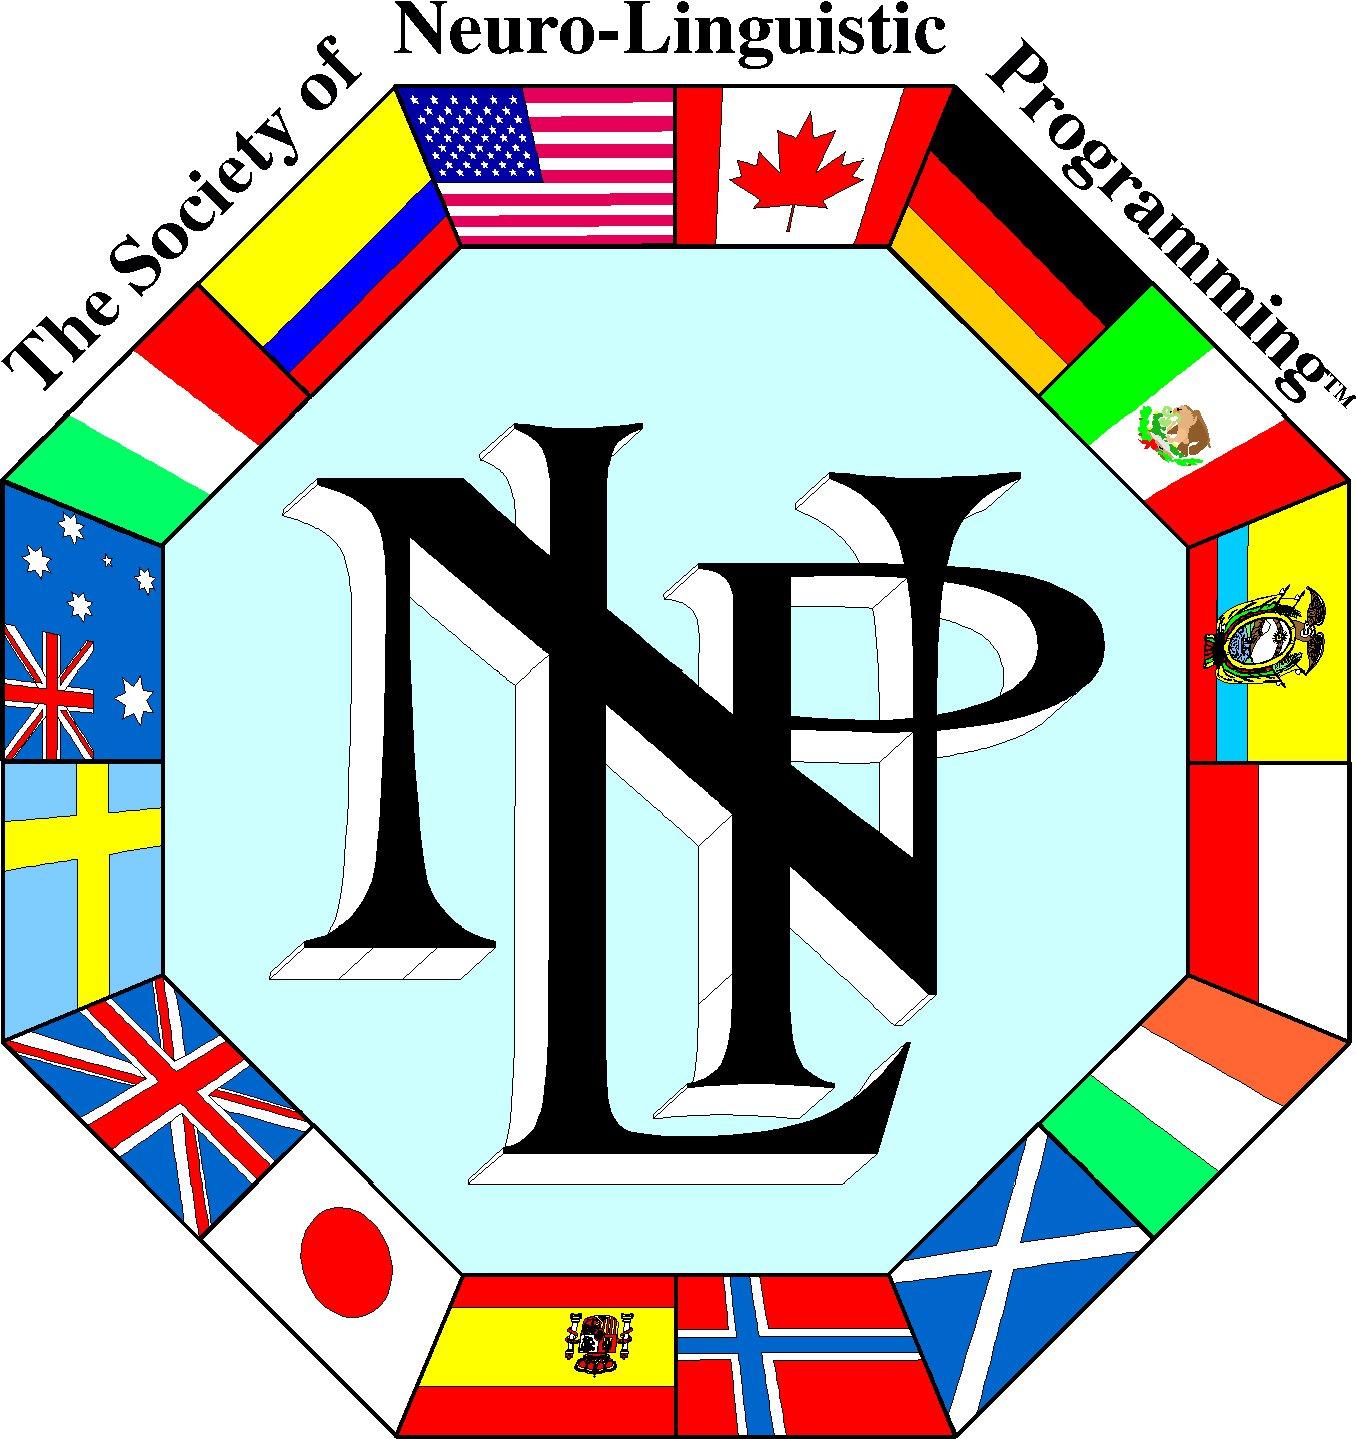 La Society of NLP